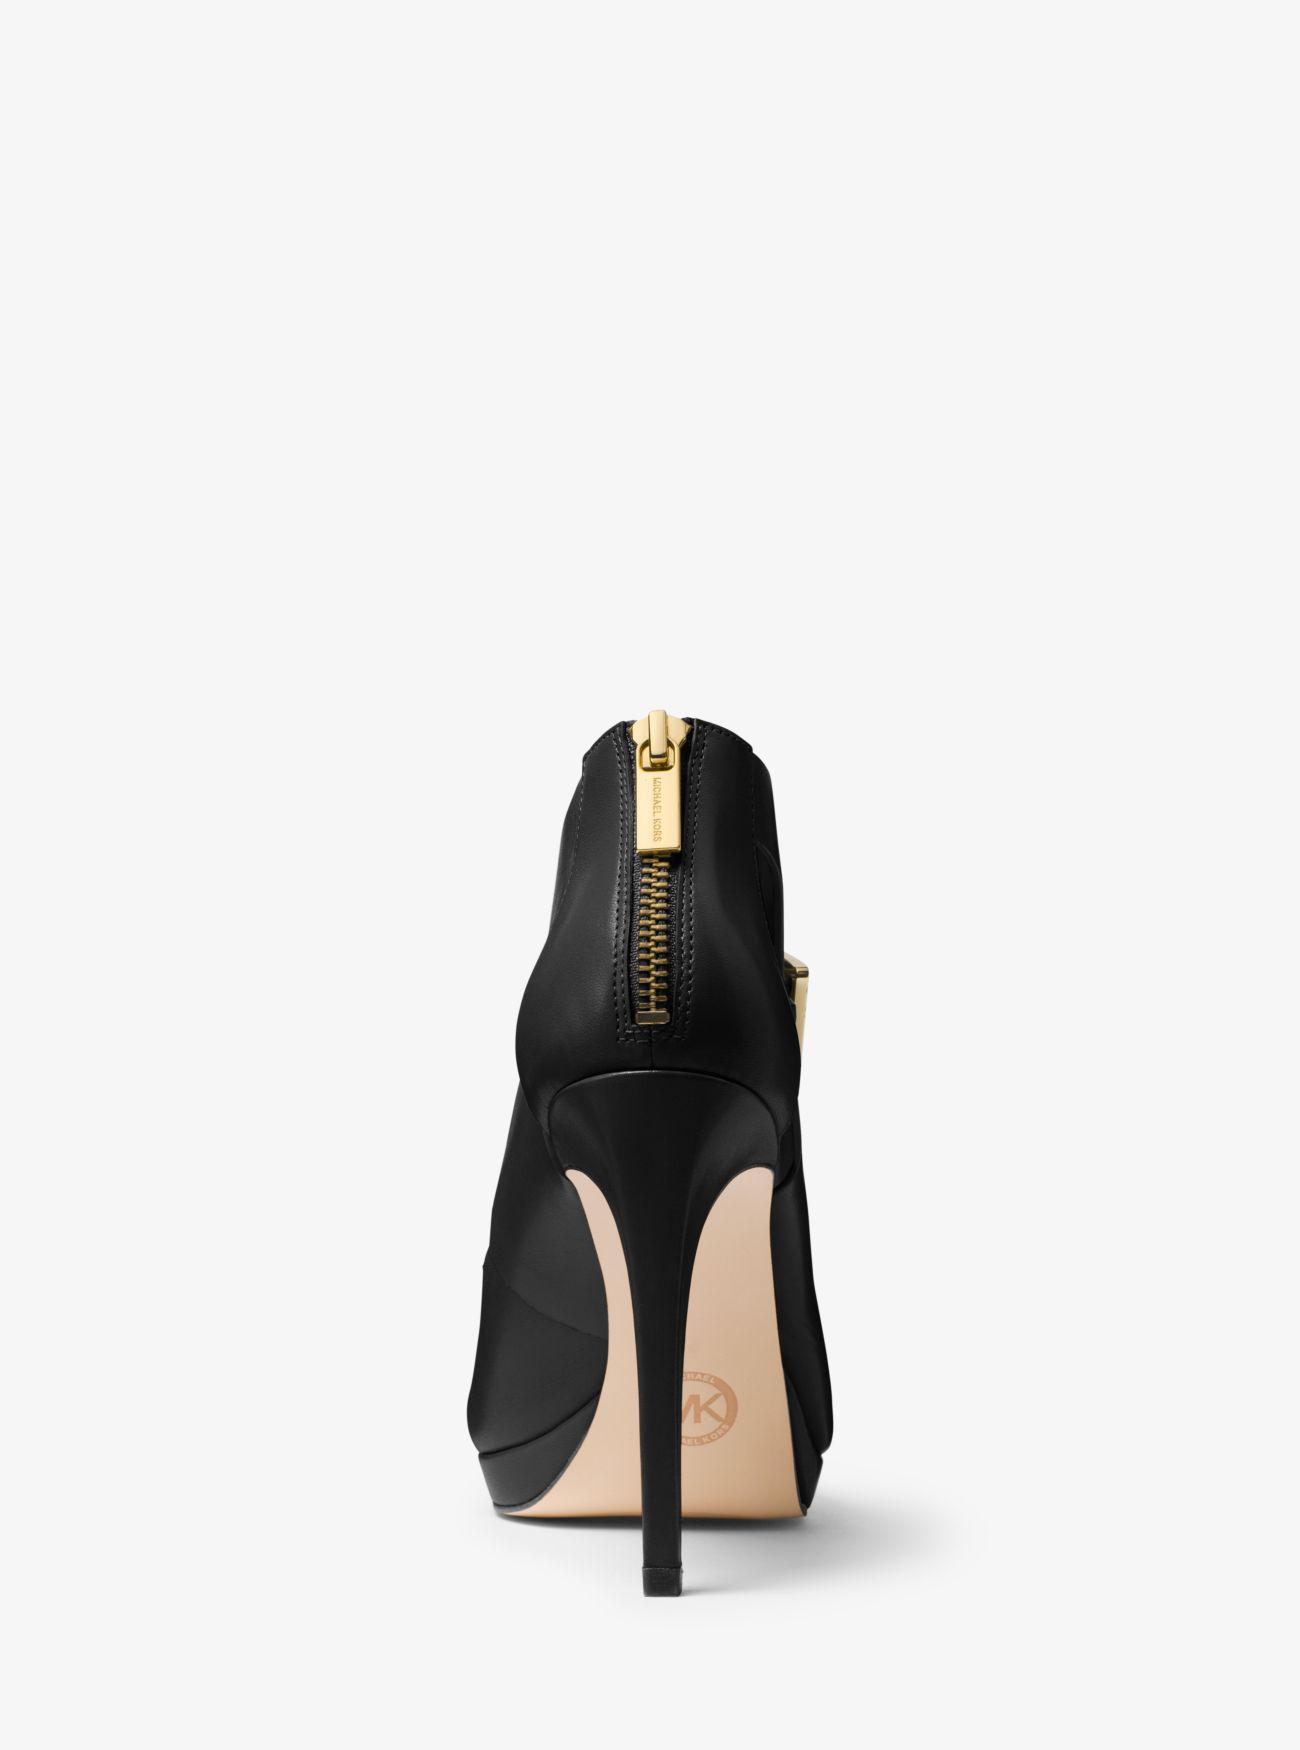 e354293a4180 Lyst - Michael Kors Kimber Leather Platform Sandal in Black